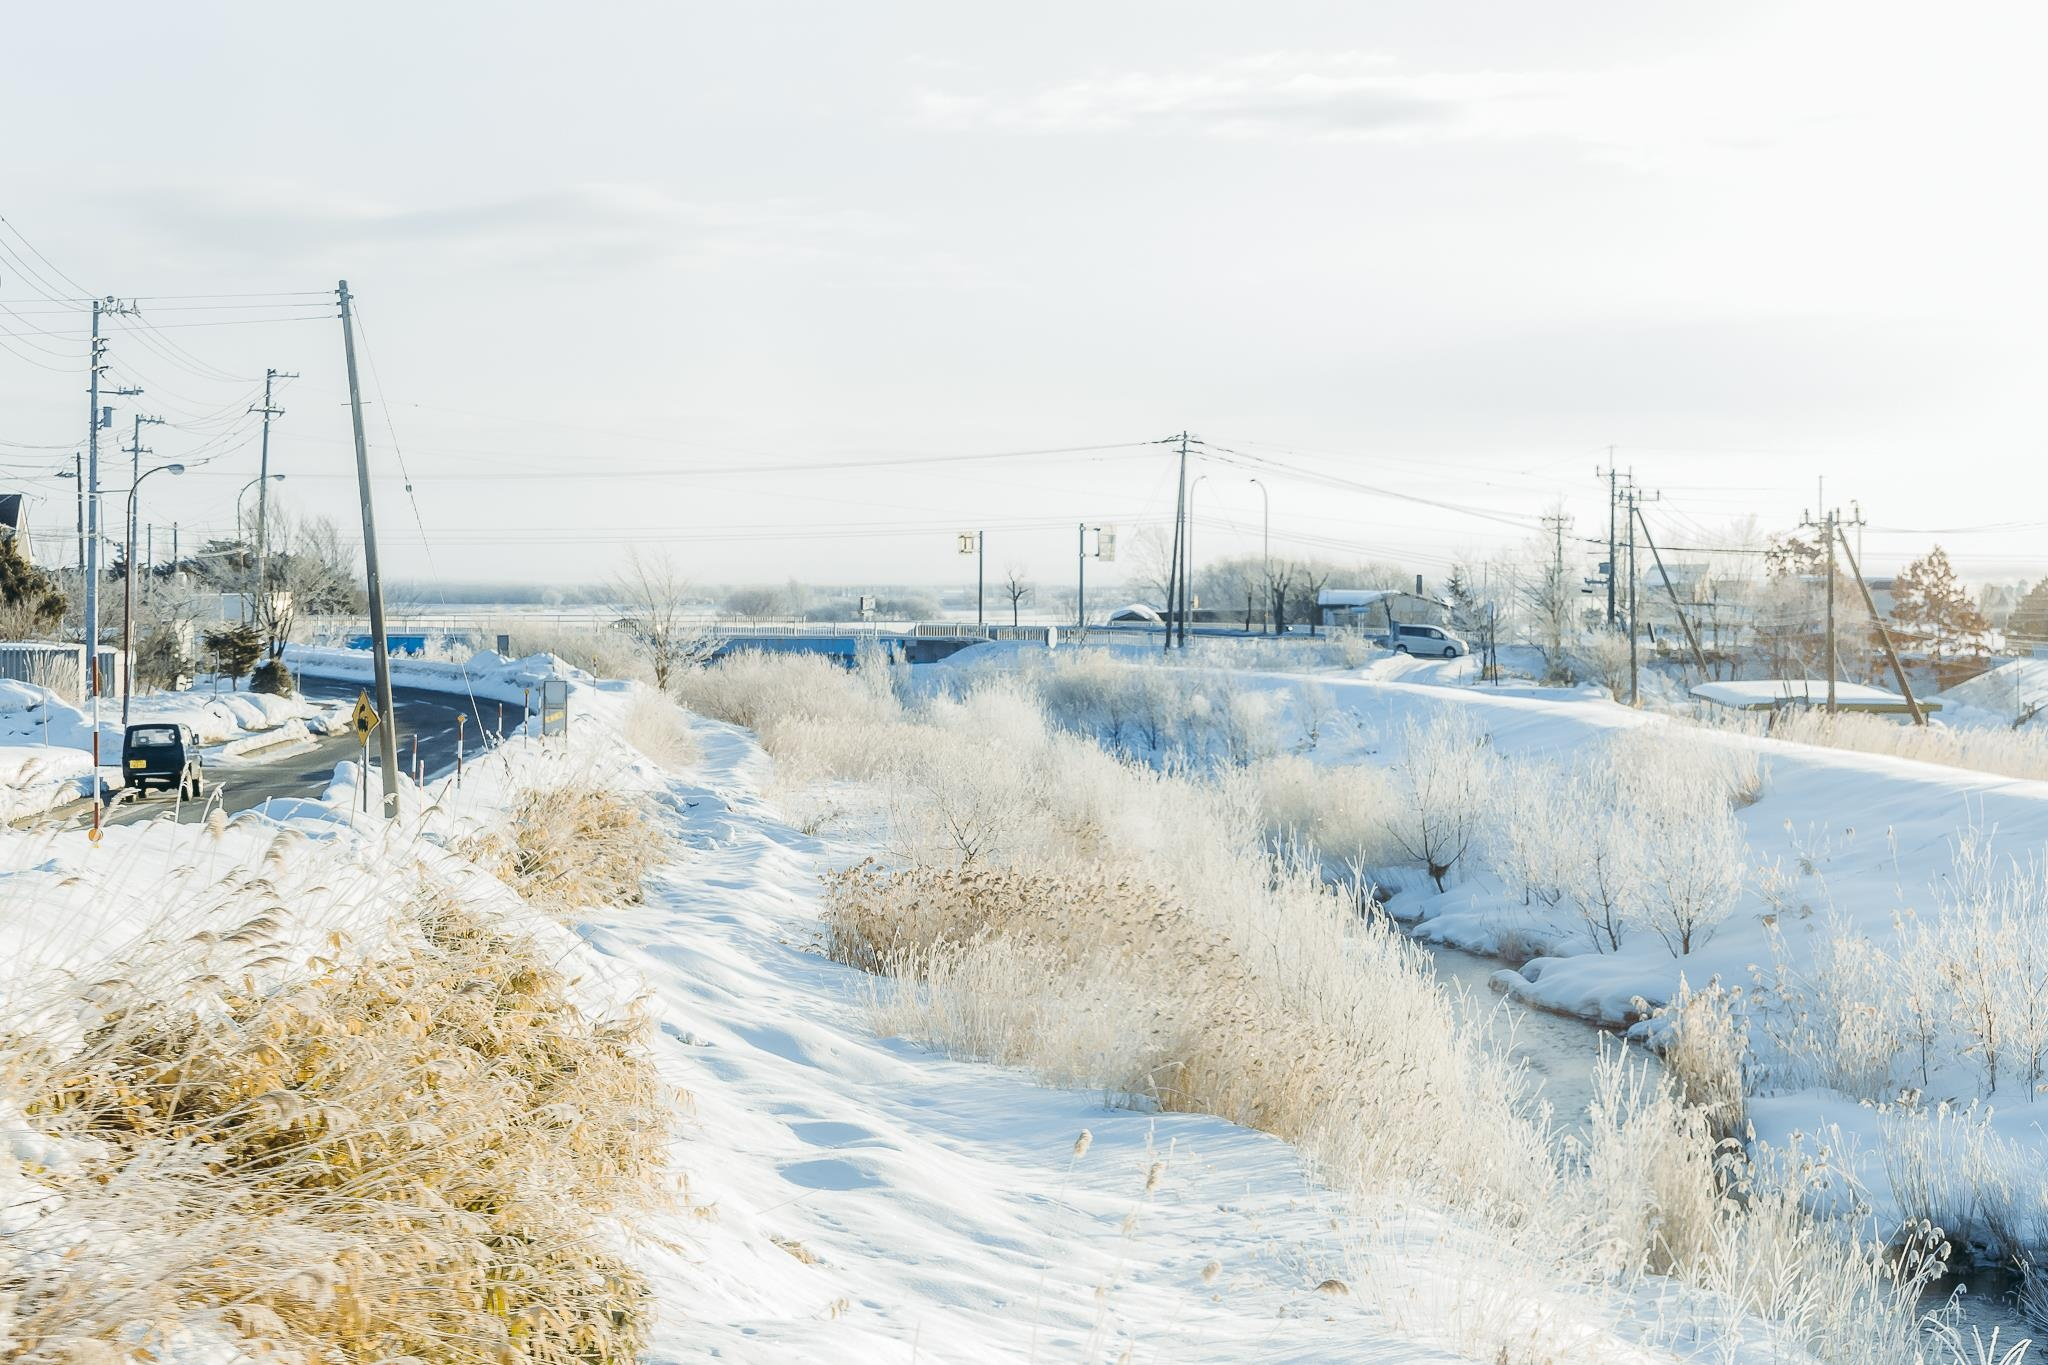 Hokkaido tuyet trang, noi dang den nhat mua dong o Nhat Ban hinh anh 3